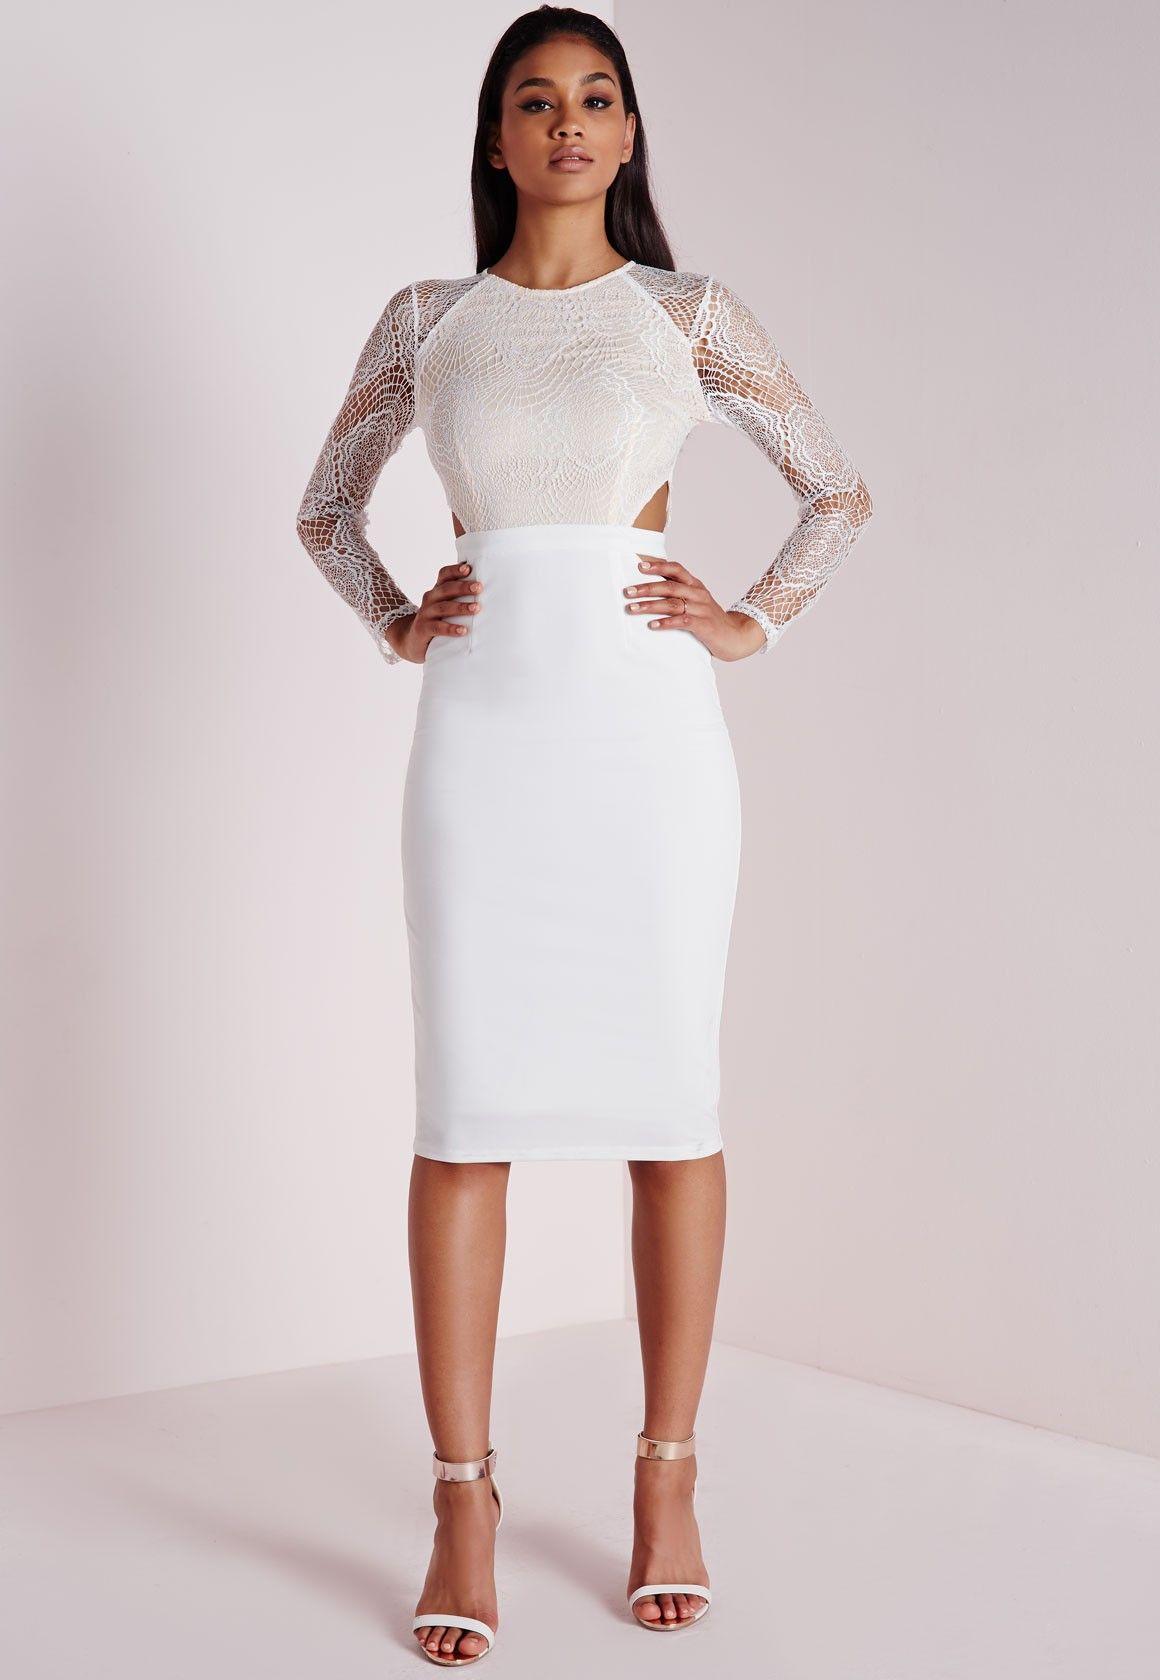 7084db918d9b Lace Long Sleeve Cut Out Midi Dress White - Dresses - Midi Dresses -  Missguided